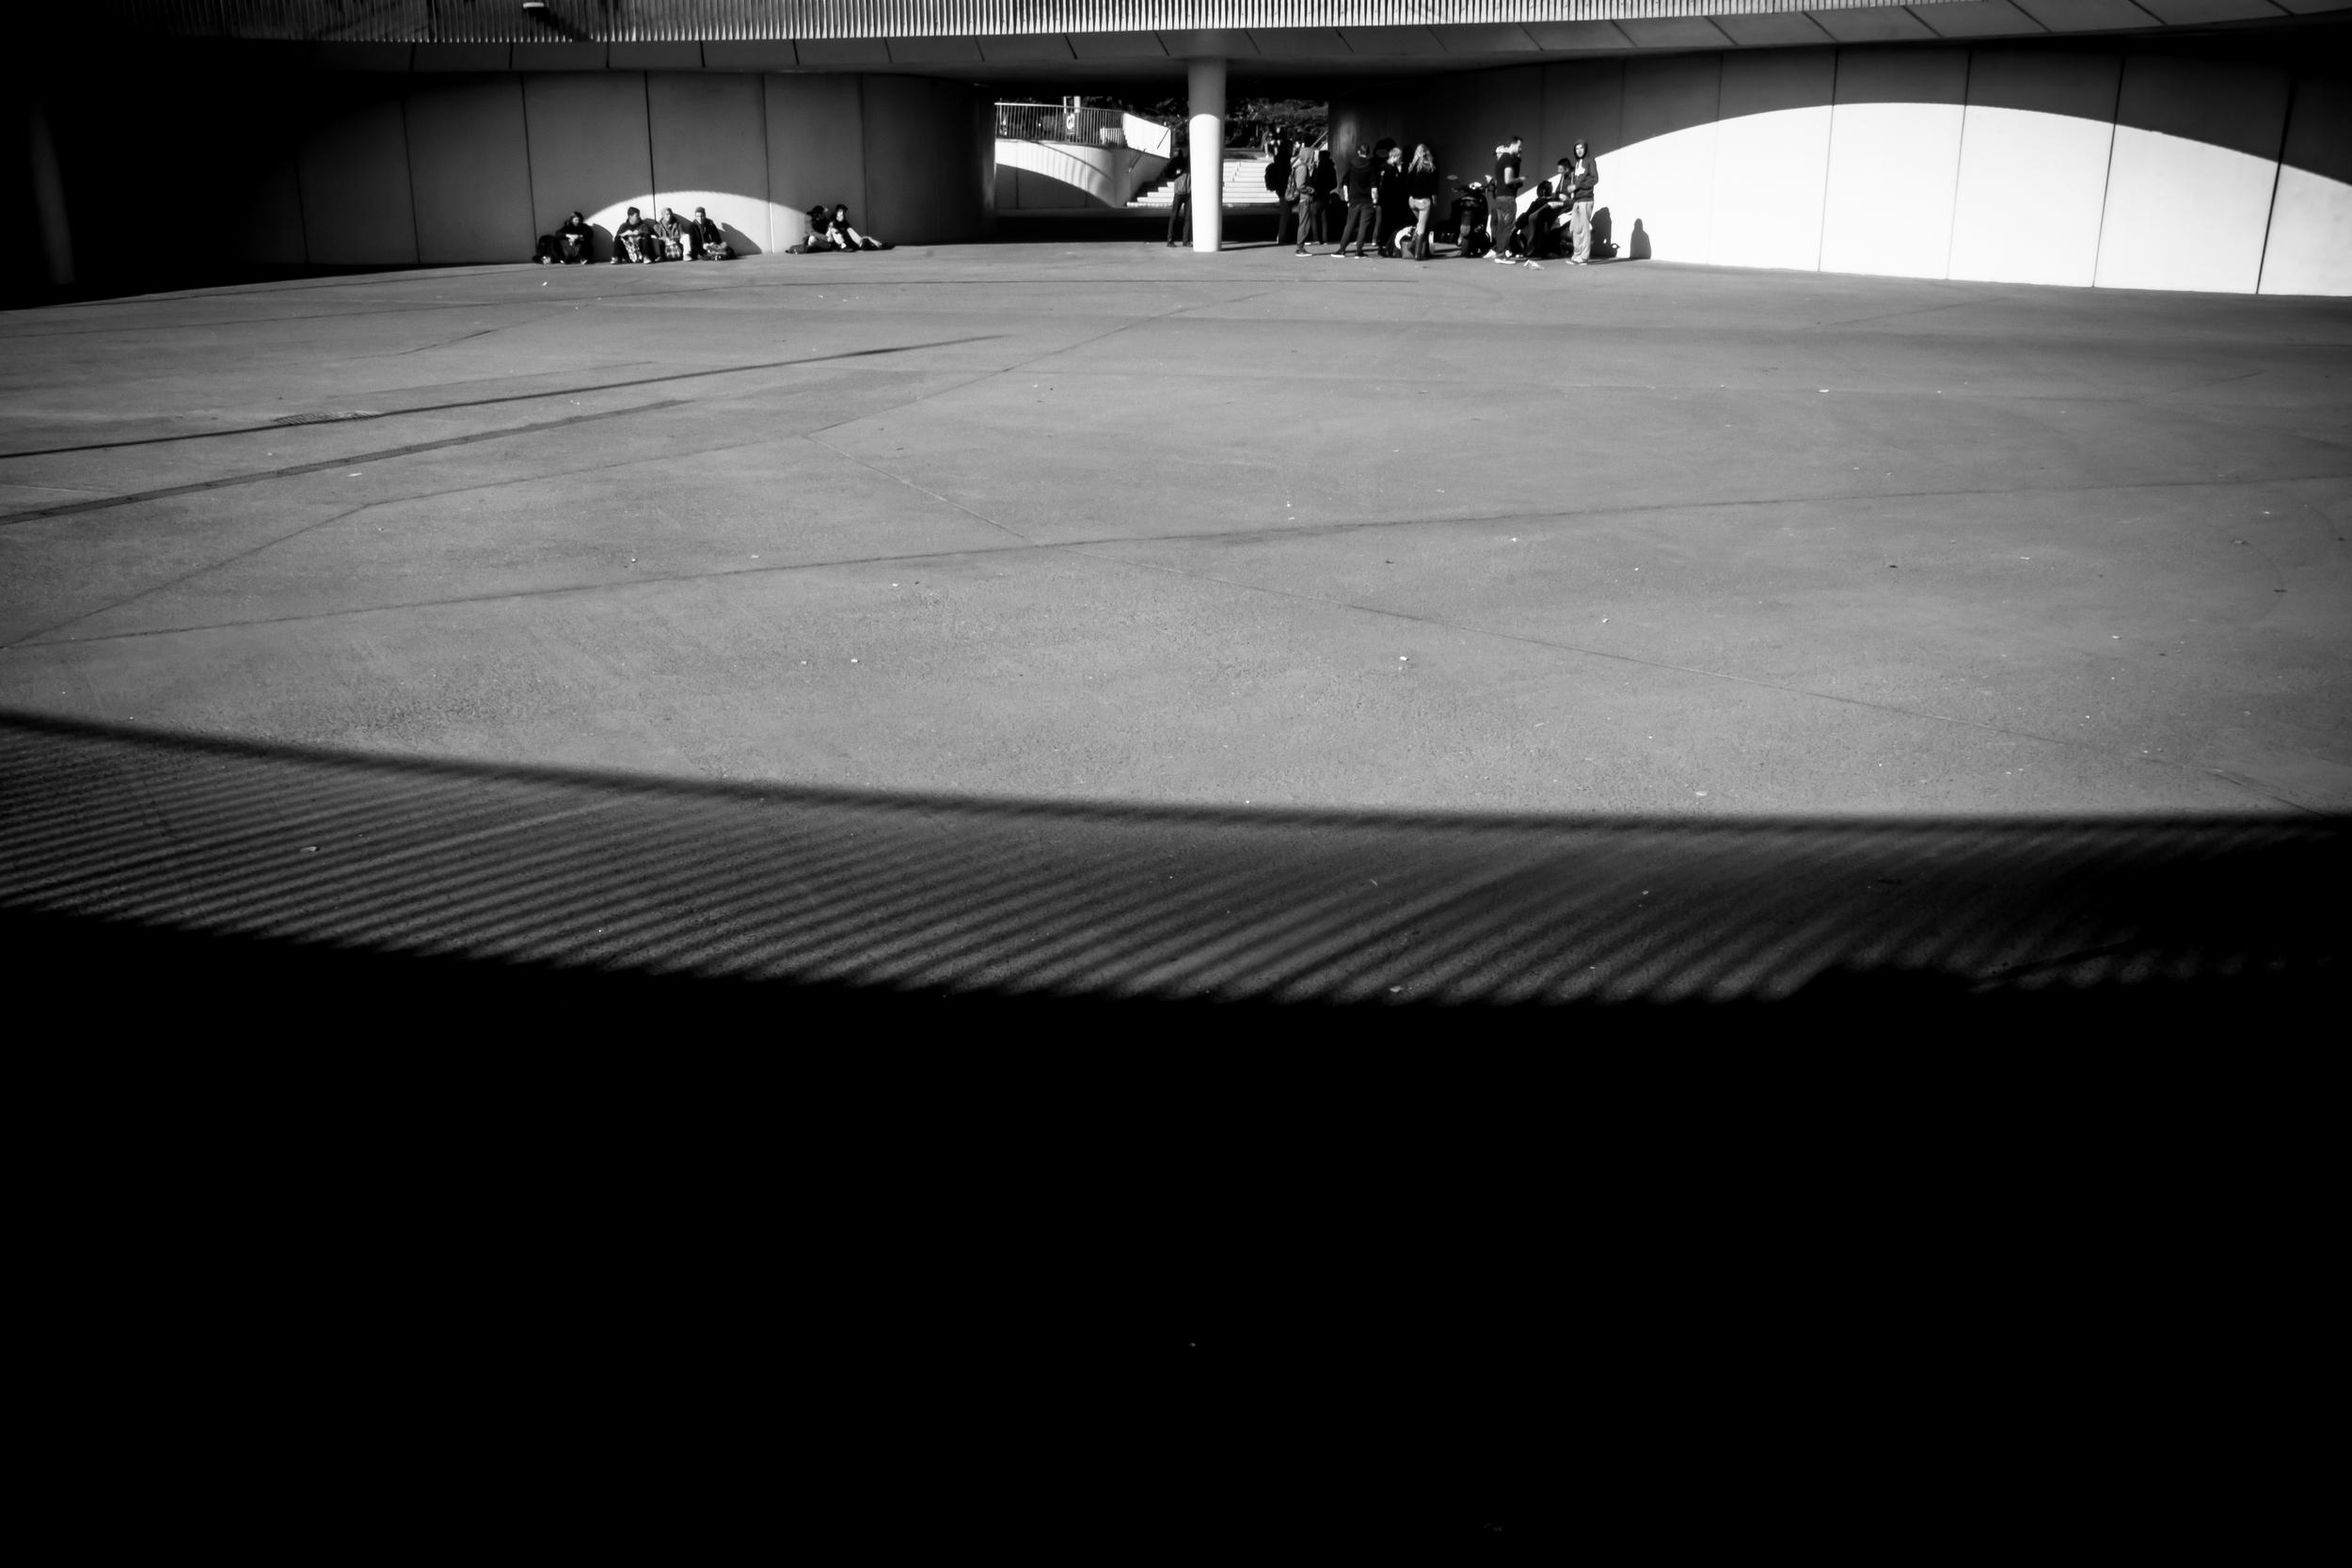 Viewfinder-looks-like-Vivian-Maier-light-shadow-waiting-station-wachten-strijklicht.jpg